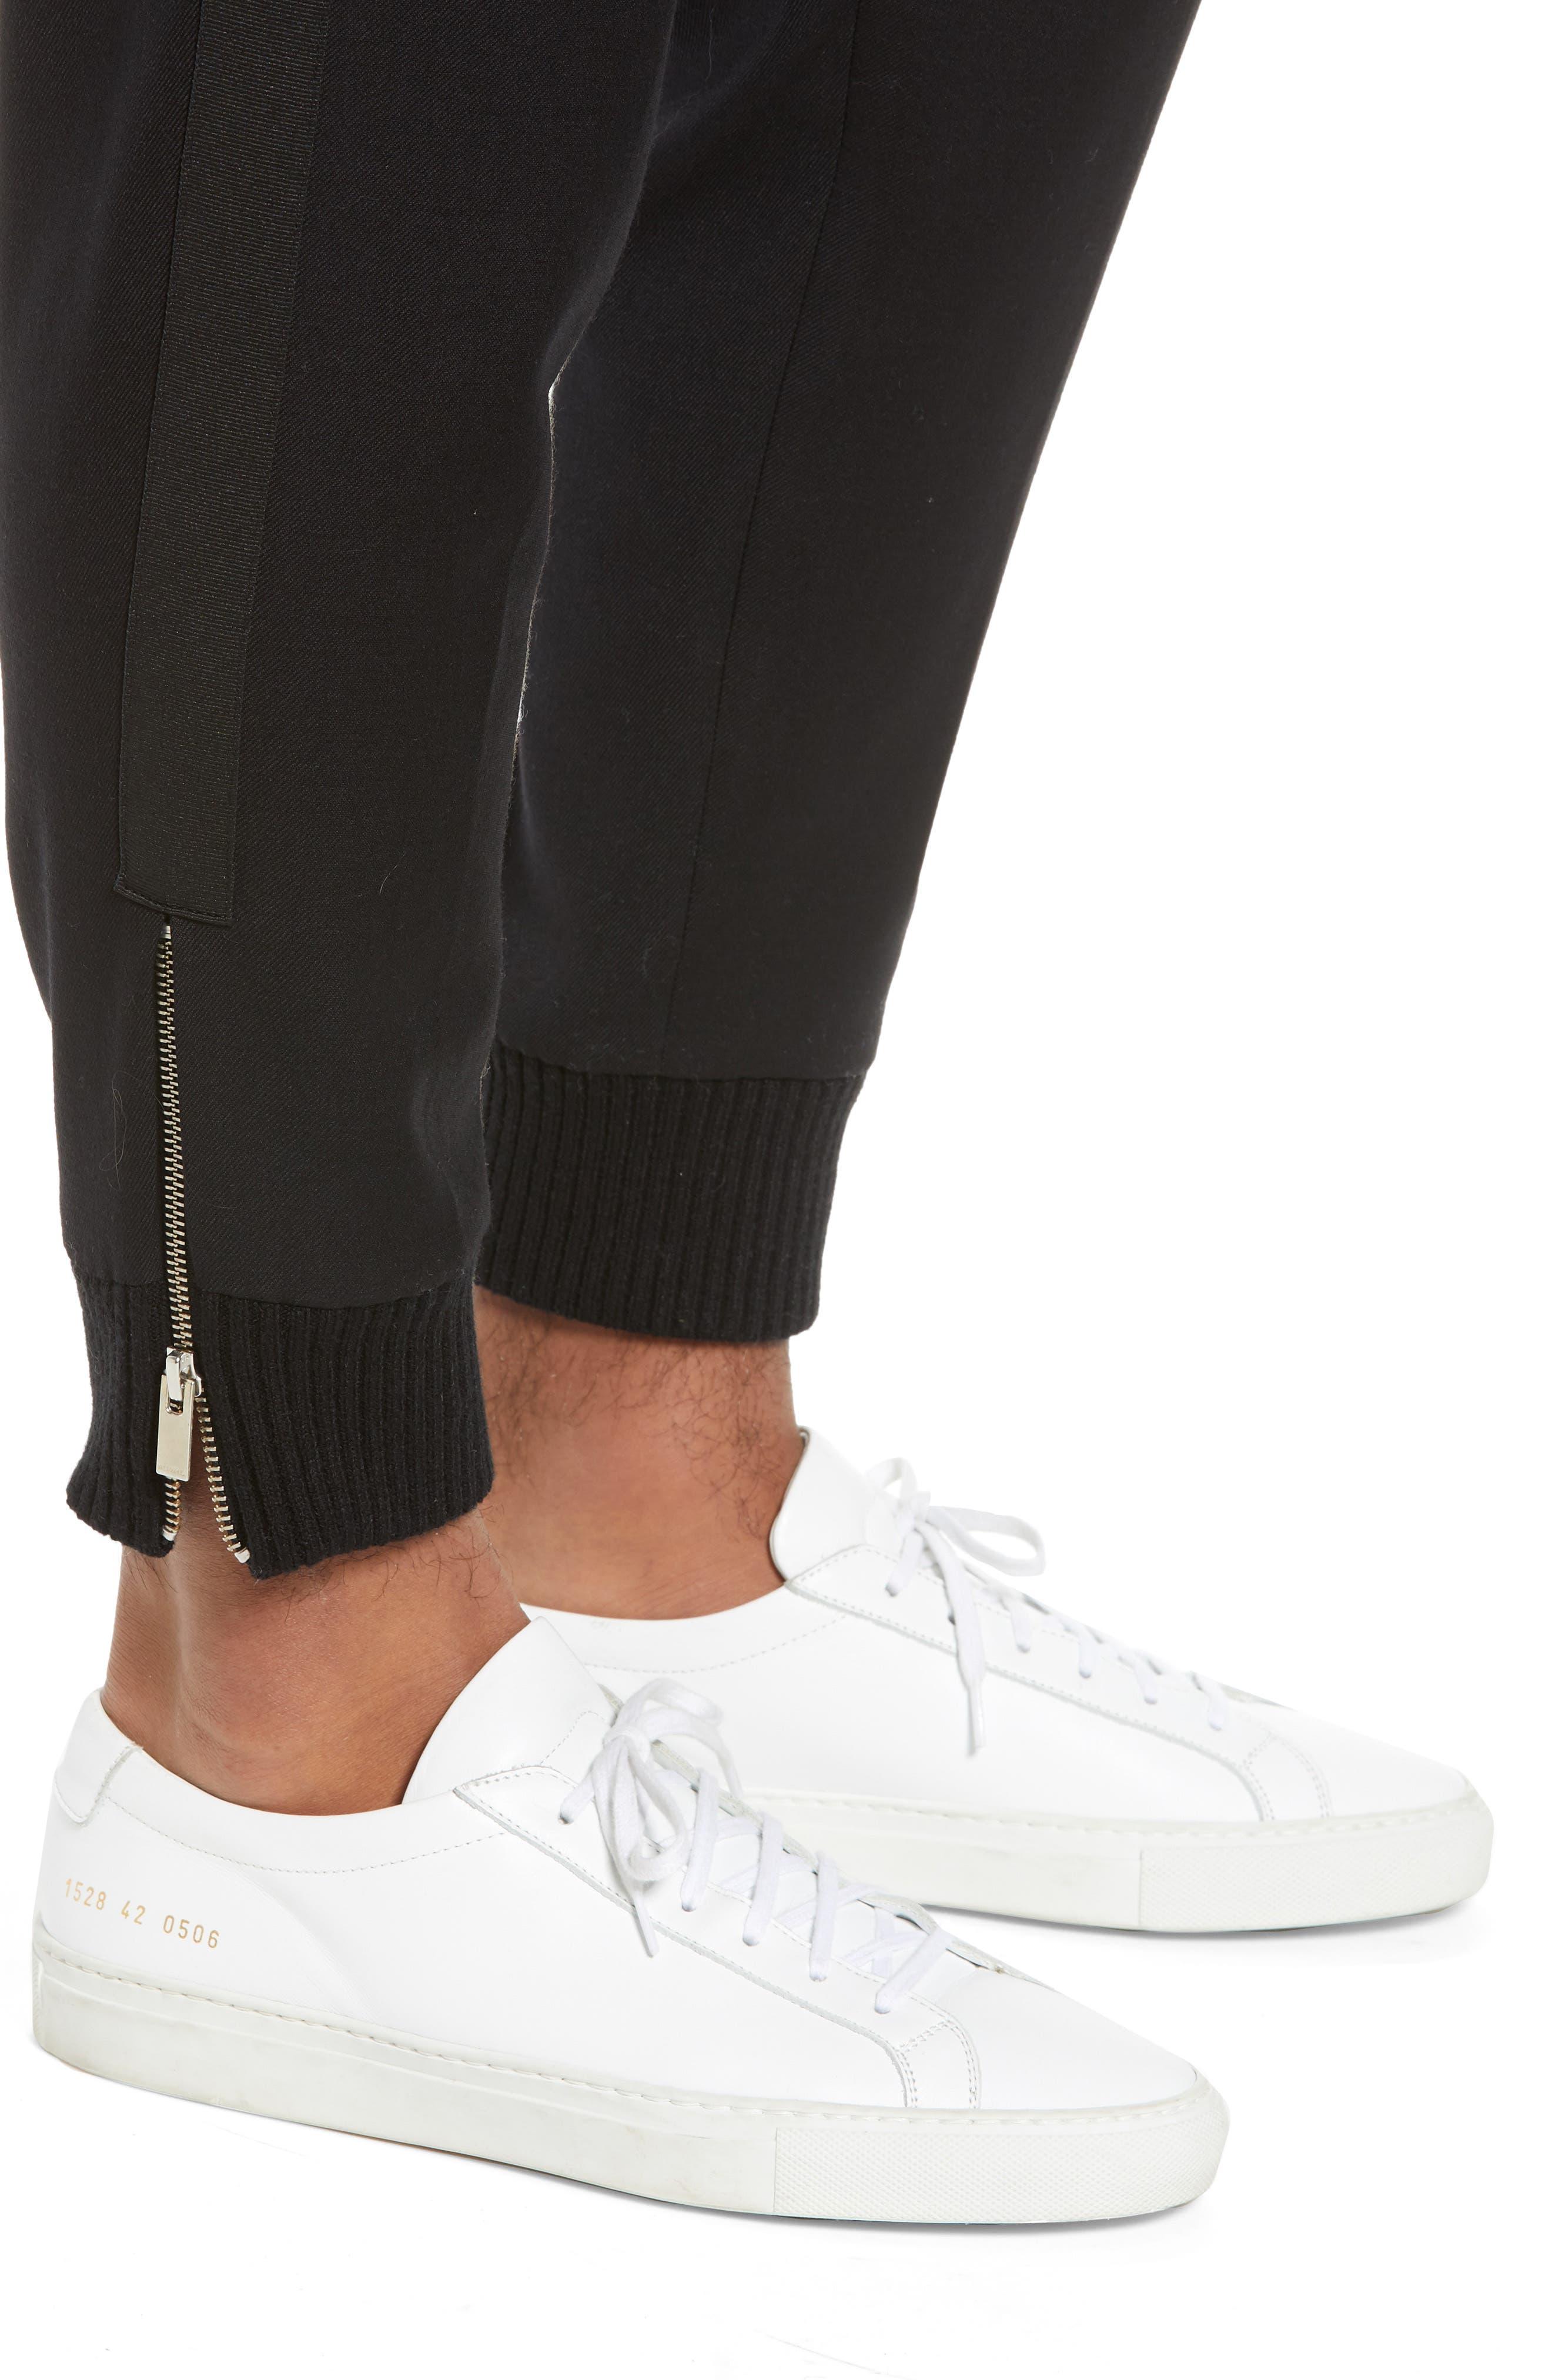 THE KOOPLES, Straight Leg Woven Jogger Pants, Alternate thumbnail 5, color, BLACK